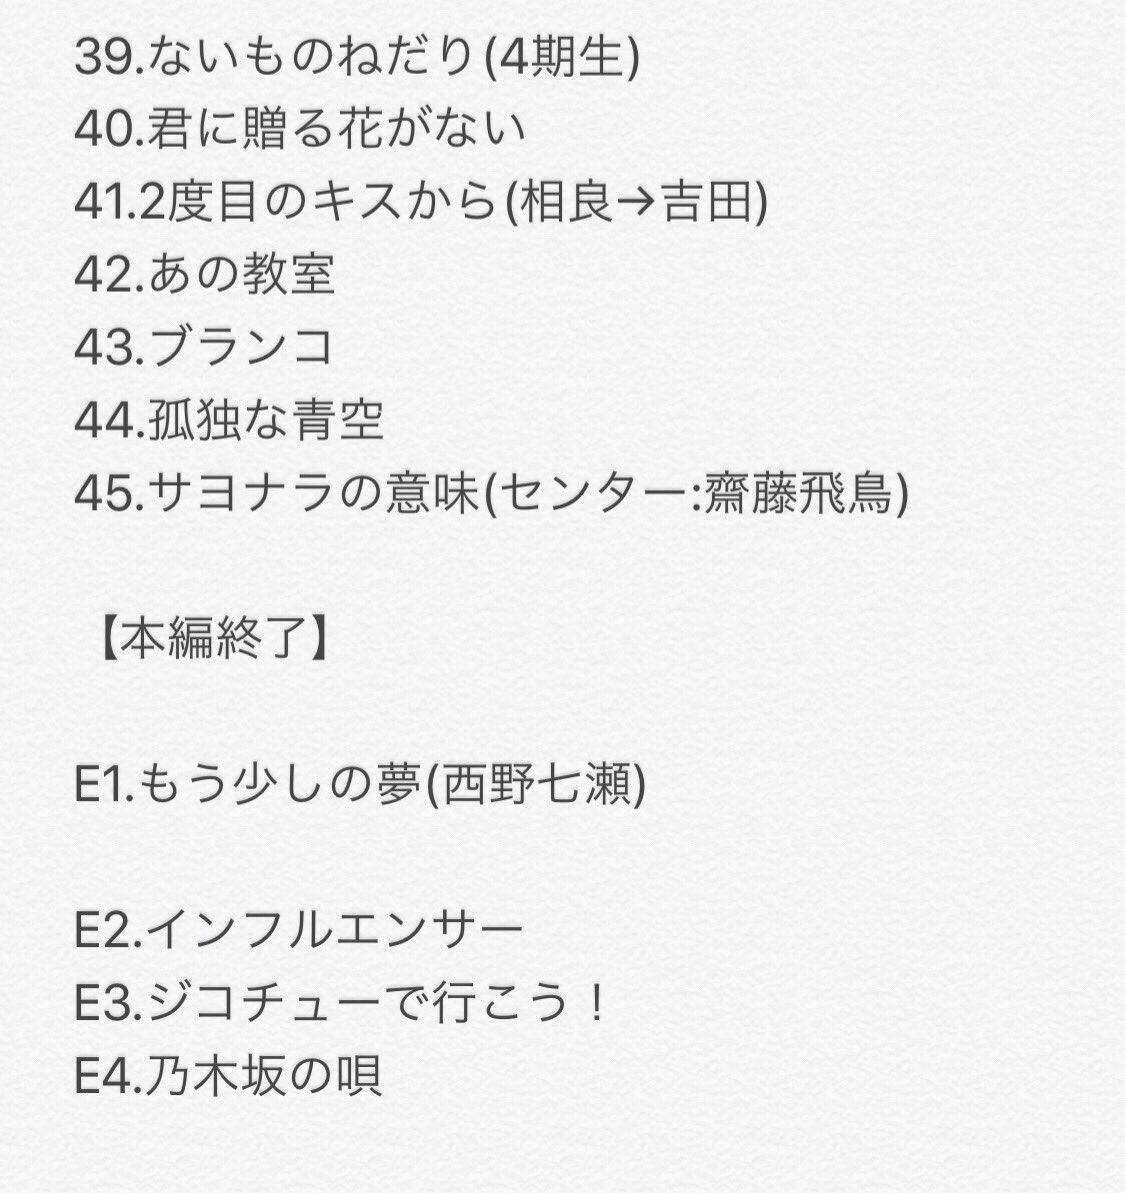 7thバスラ,高山一実,光合成希望,西野七瀬,サプライズ,登場,卒業,201902224